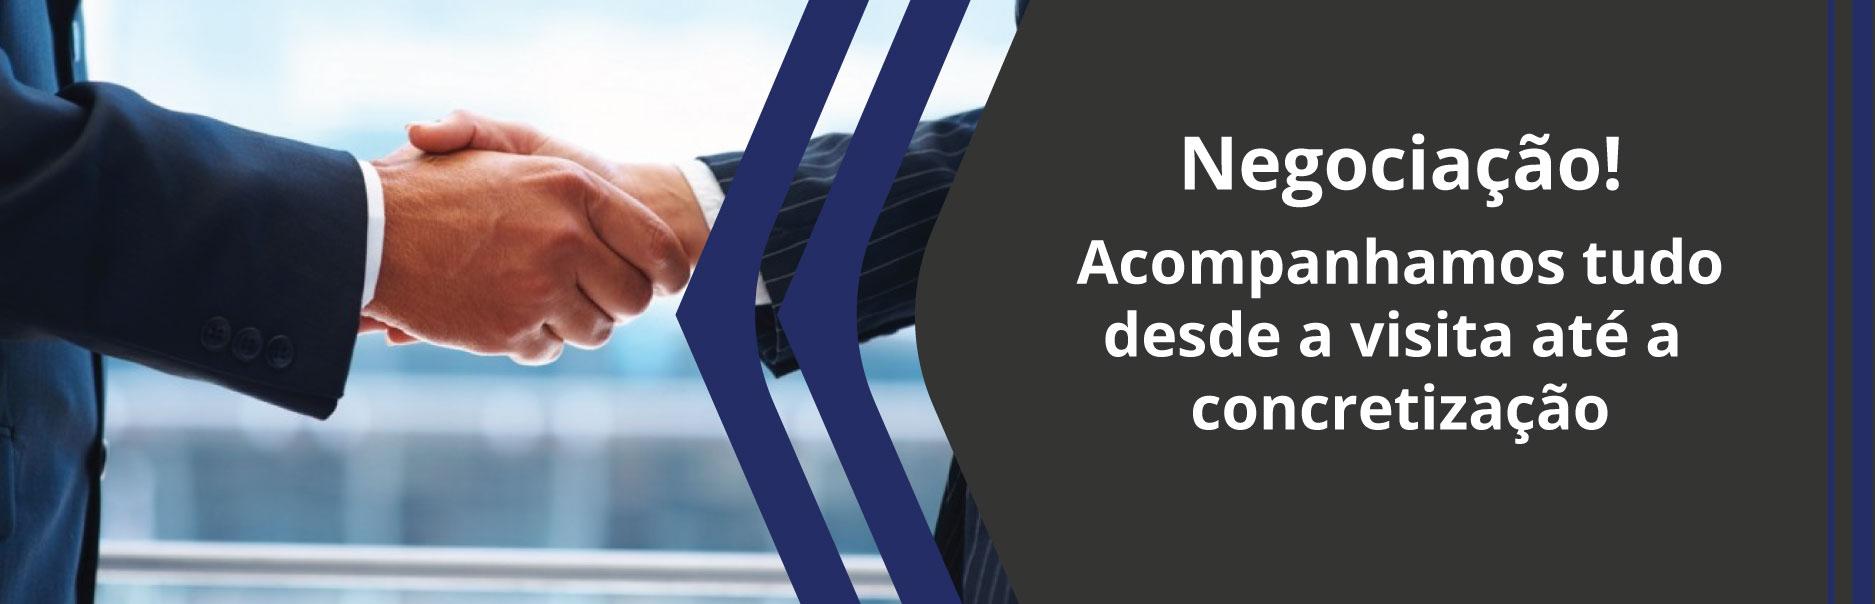 visaocomercios-negociacao